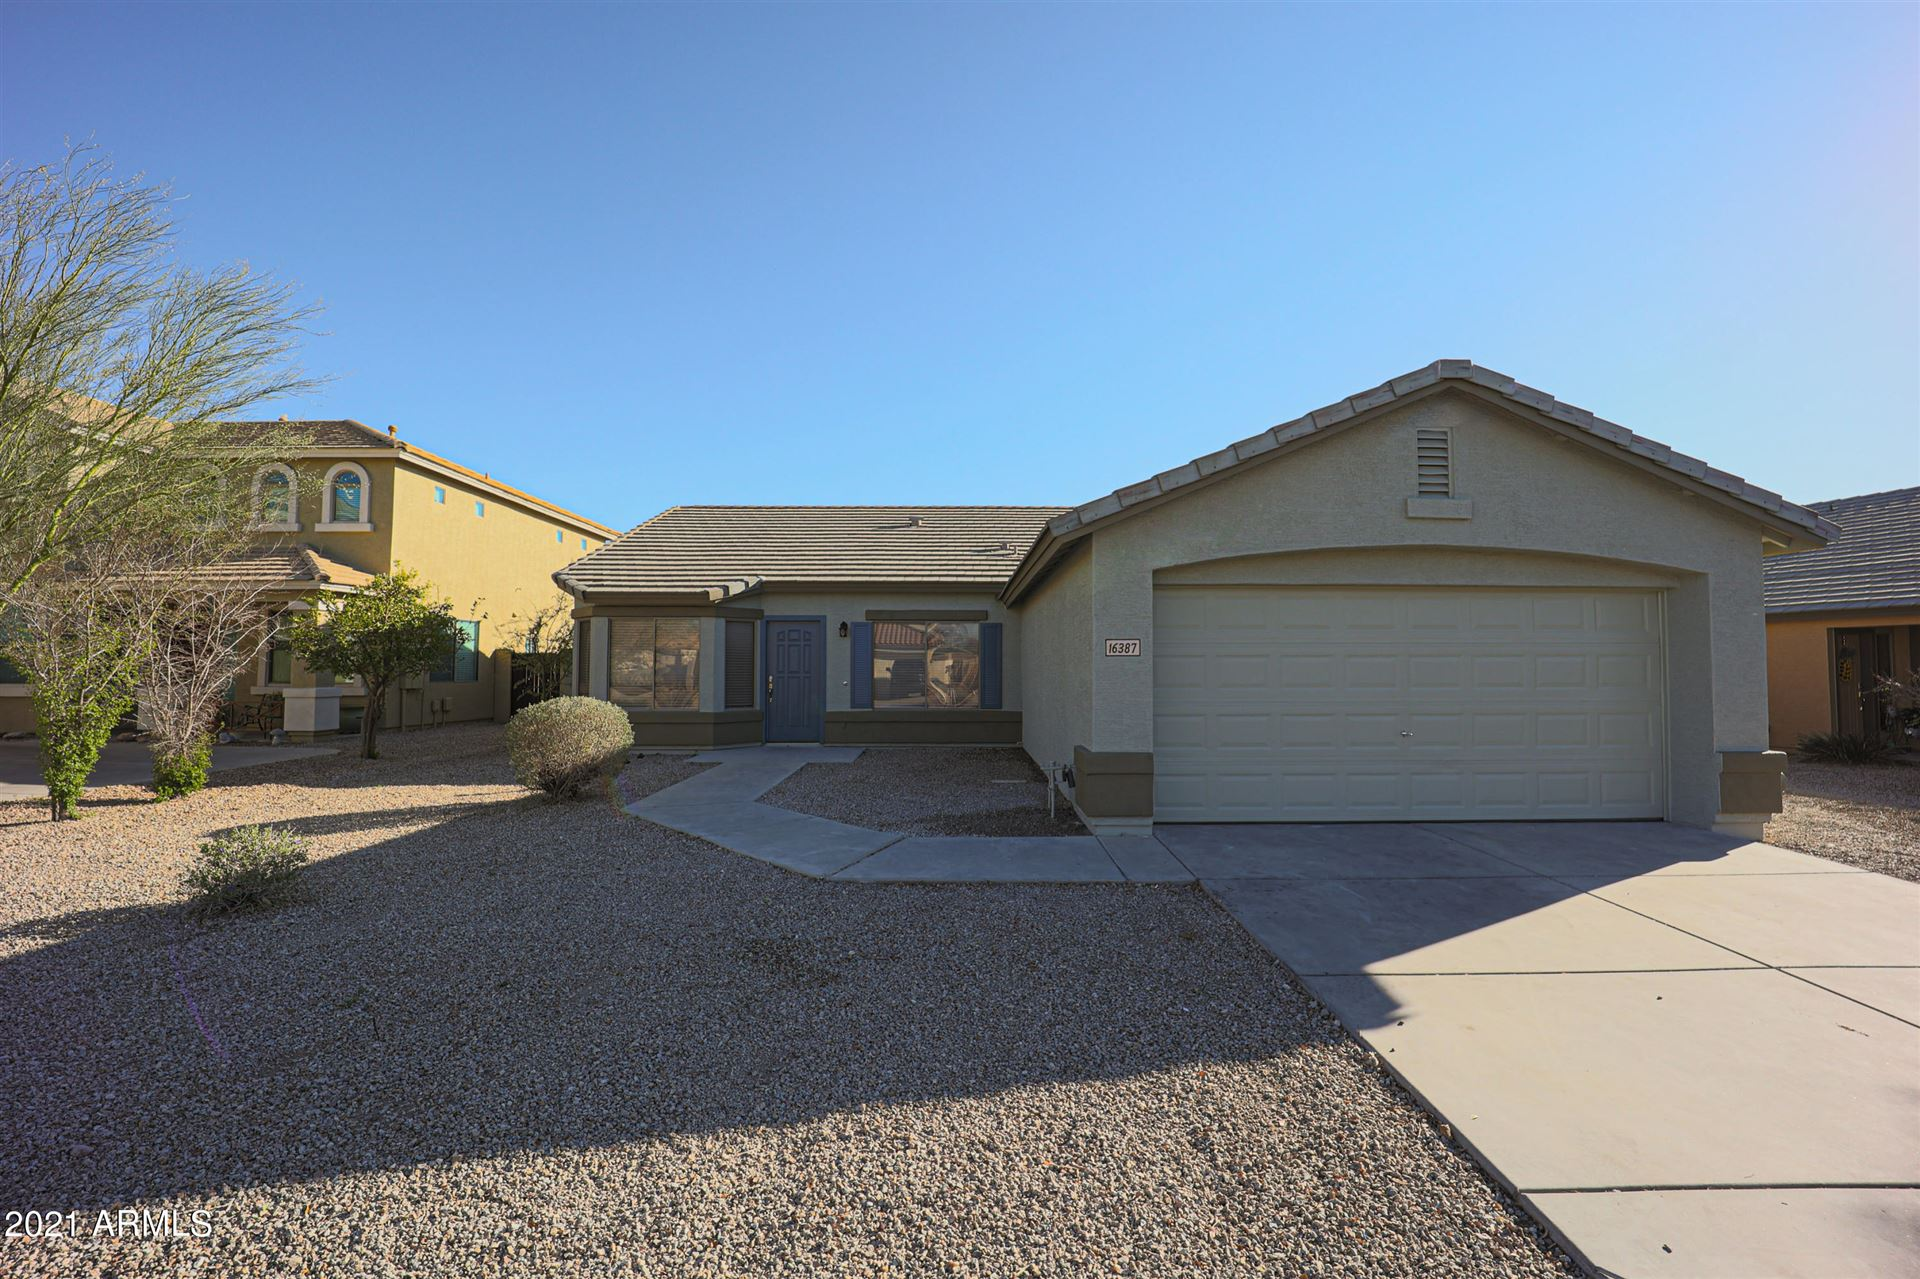 Photo of 16387 W MONROE Street, Goodyear, AZ 85338 (MLS # 6199277)